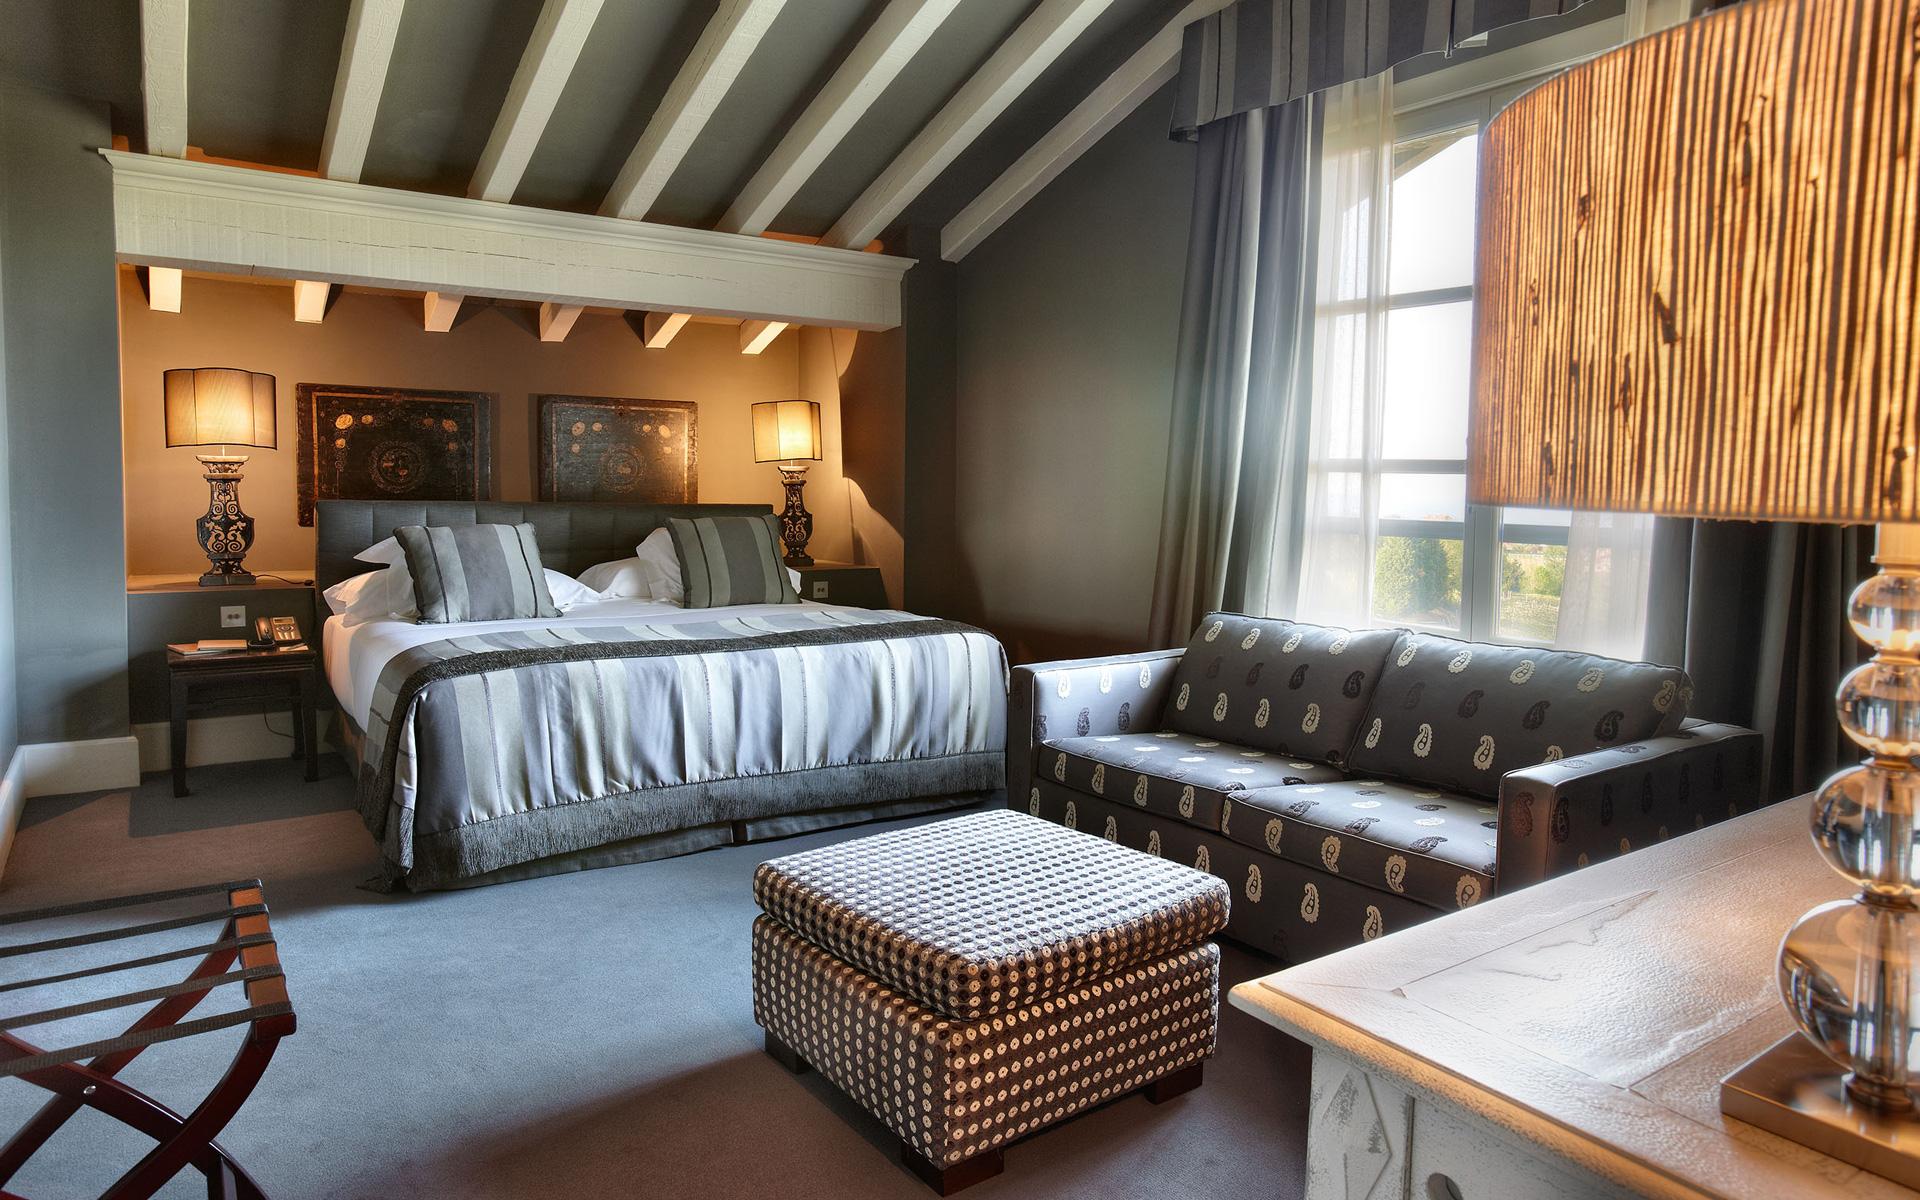 Chambre zarautz hotel iturregi h tel rural de luxe for Ver habitaciones de hoteles